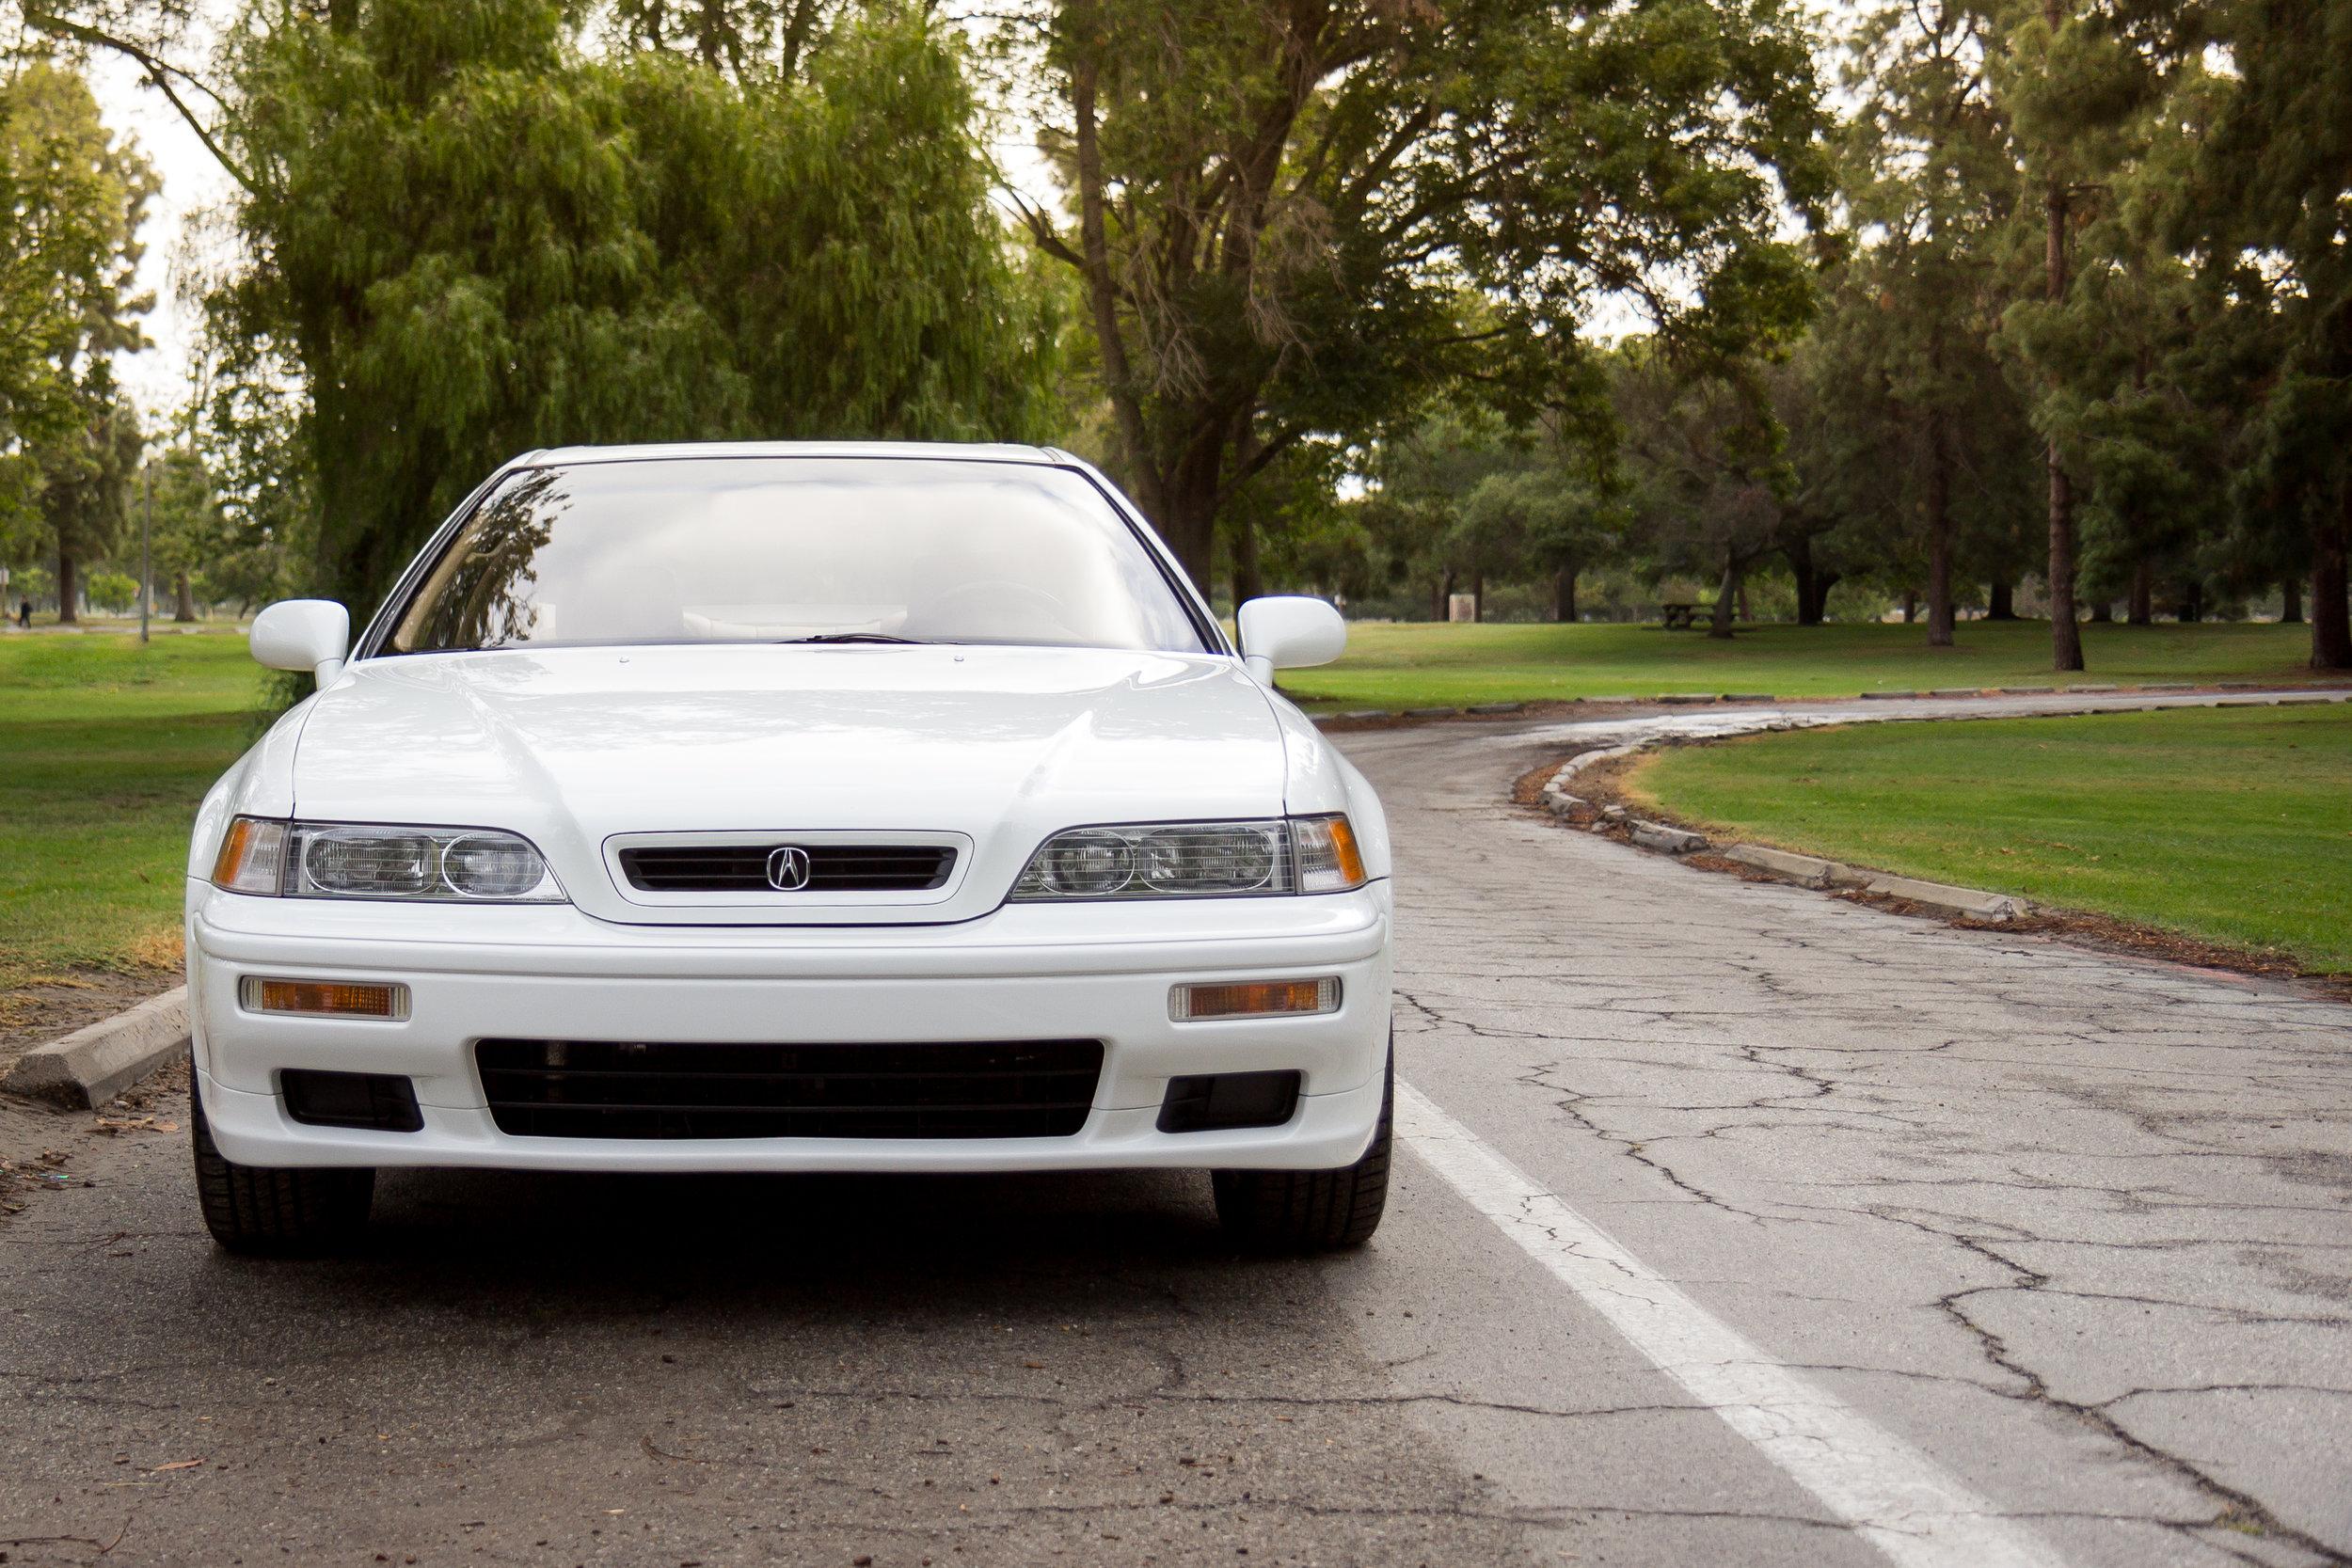 1994 Acura Legend Coupe-20.JPG